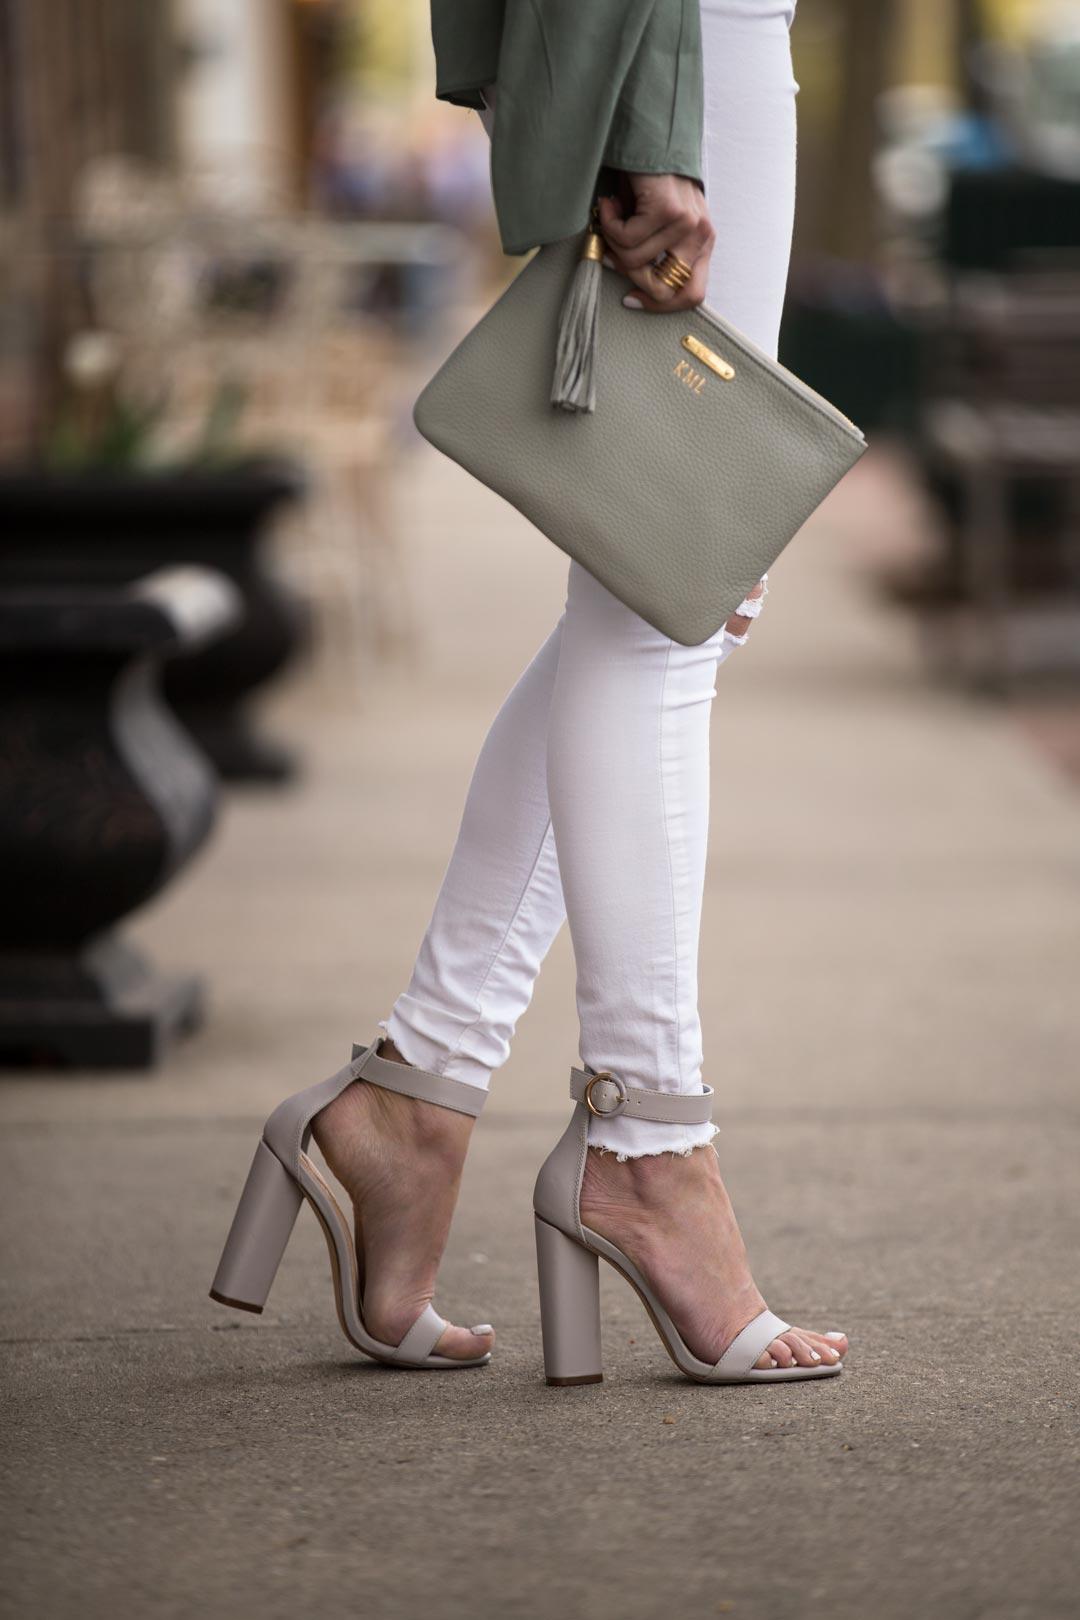 gigi new york uber clutch and go jane gray strappy sandals